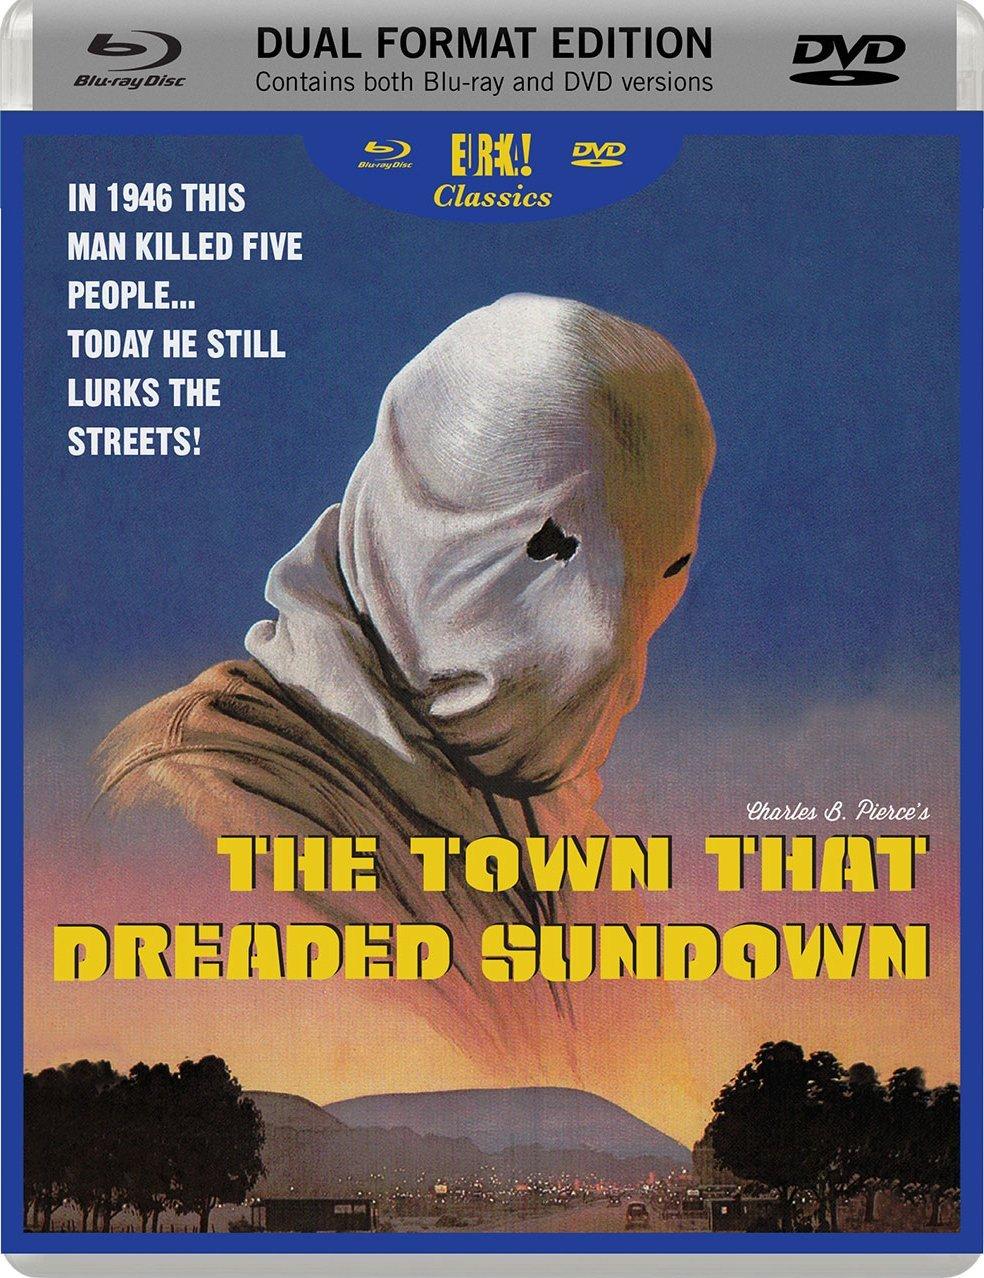 Buy The Town That Dreaded Sundown